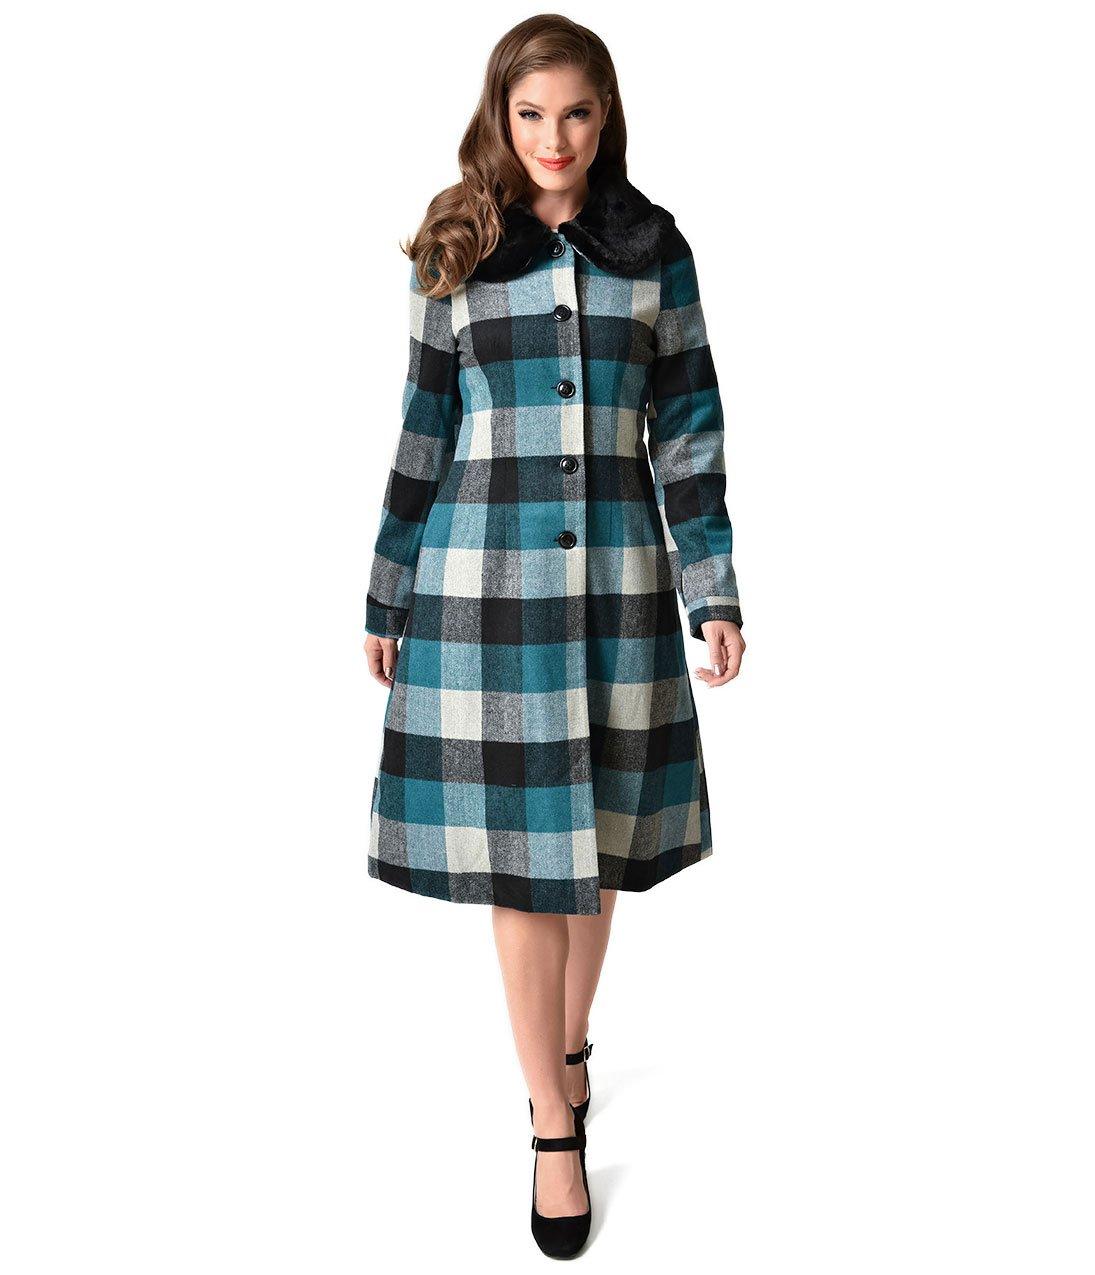 Voodoo Vixen Blue & Black Plaid Wooly Beatrice Coat